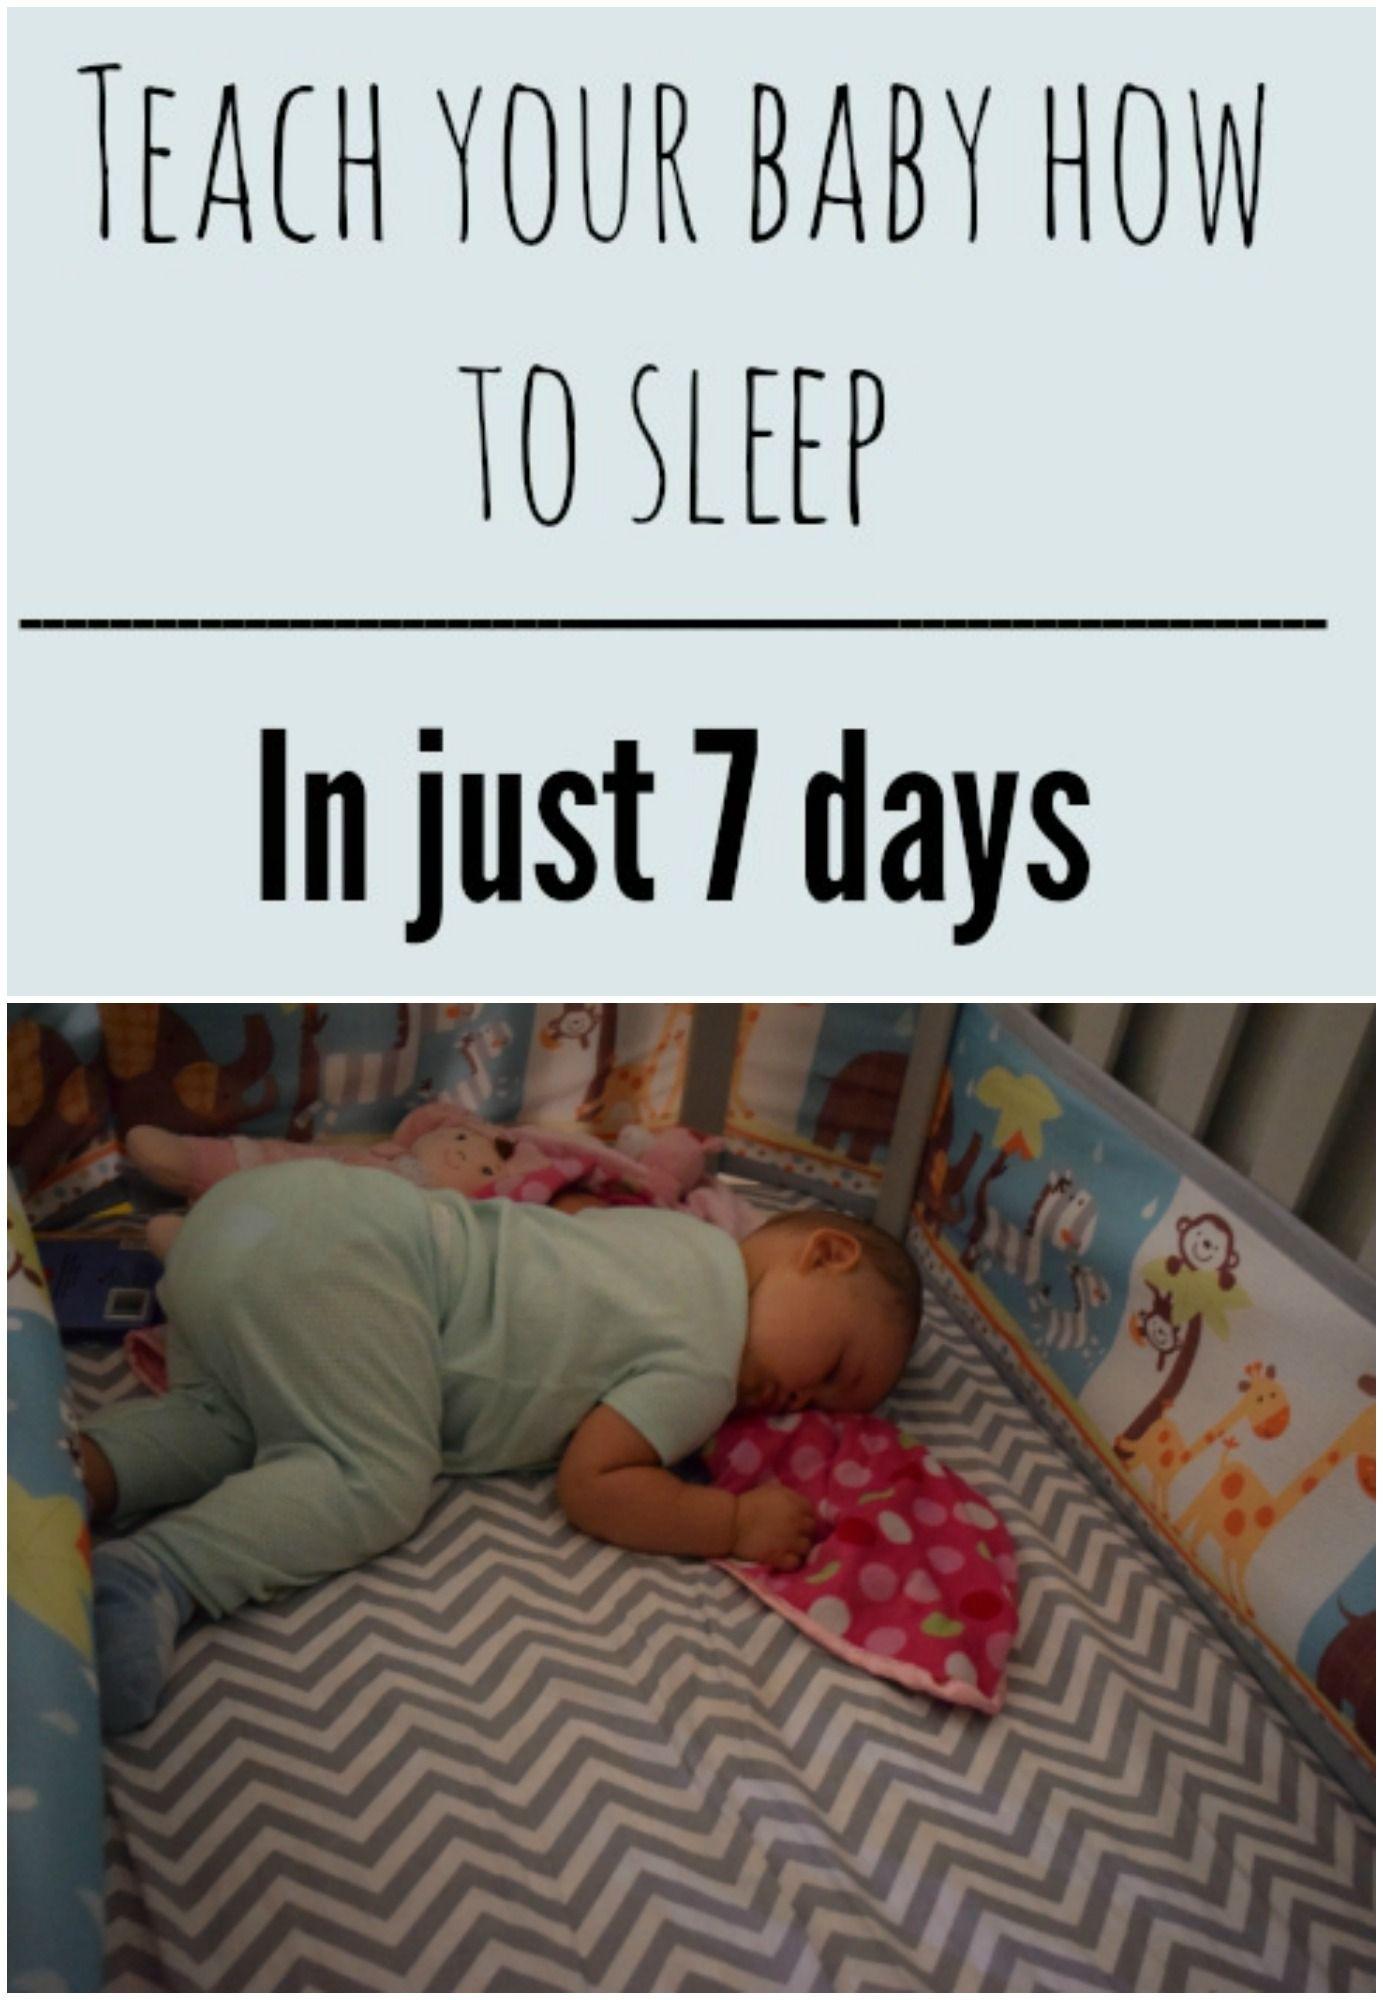 Teach Your Baby How to Sleep {in 7 days